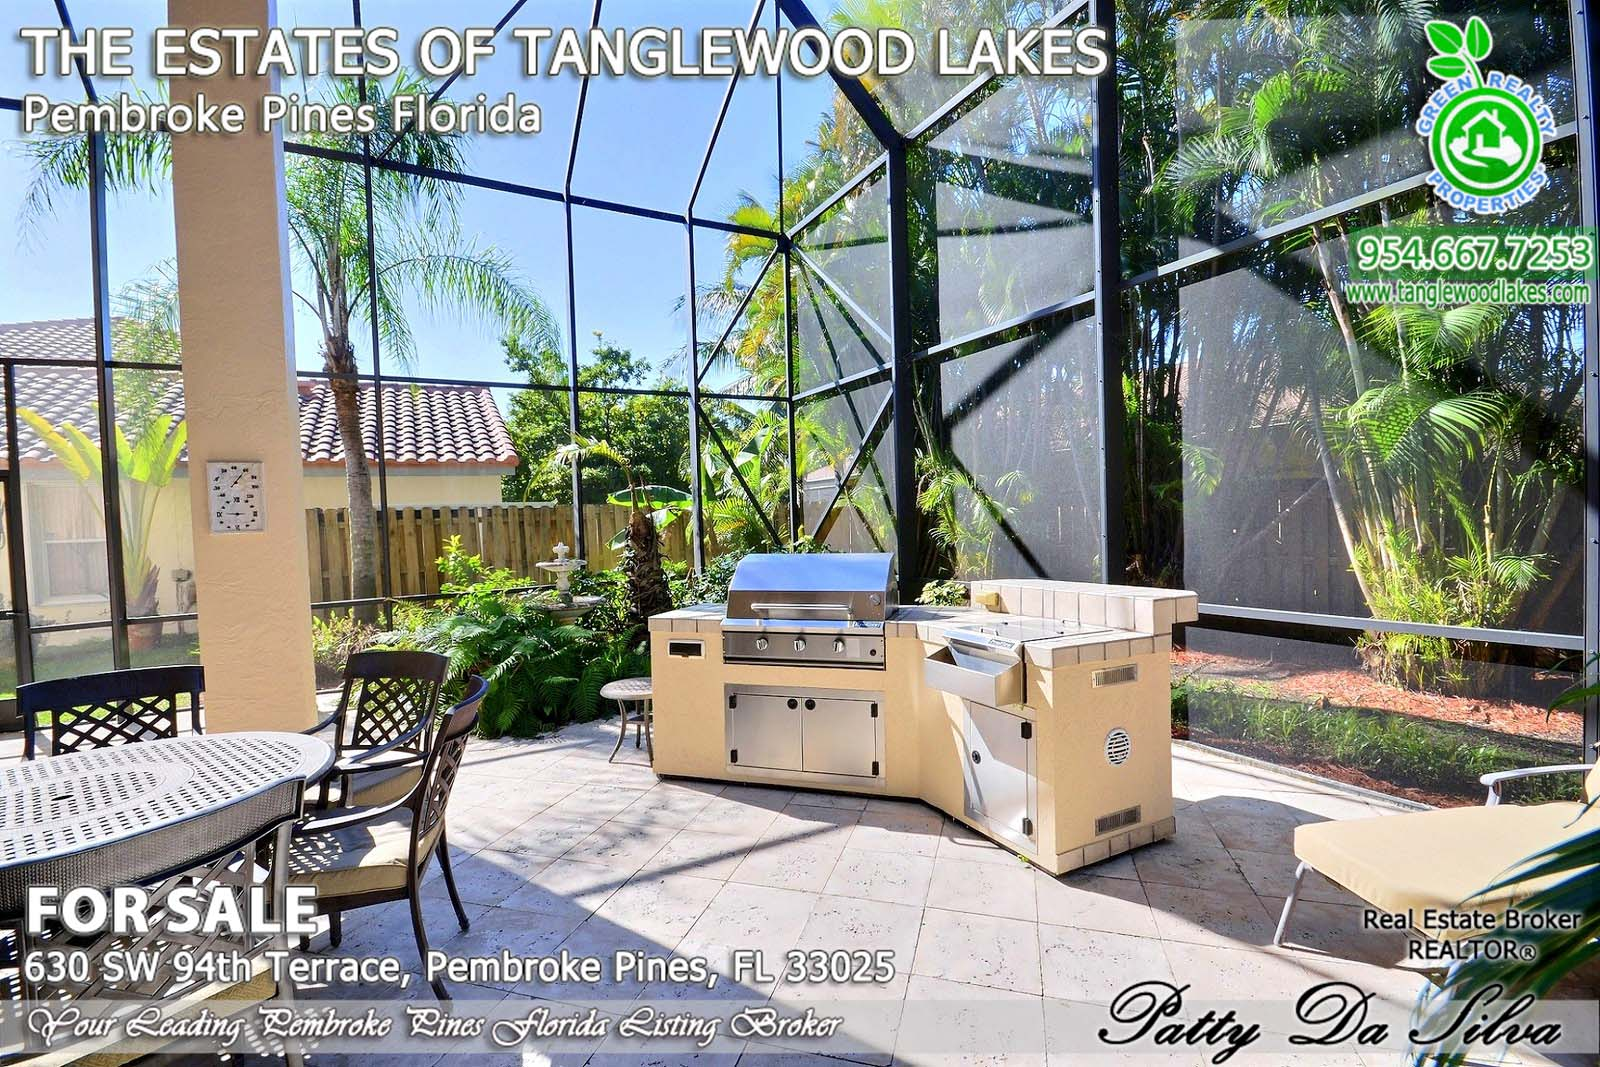 Tanglewood Lakes Best Realtors